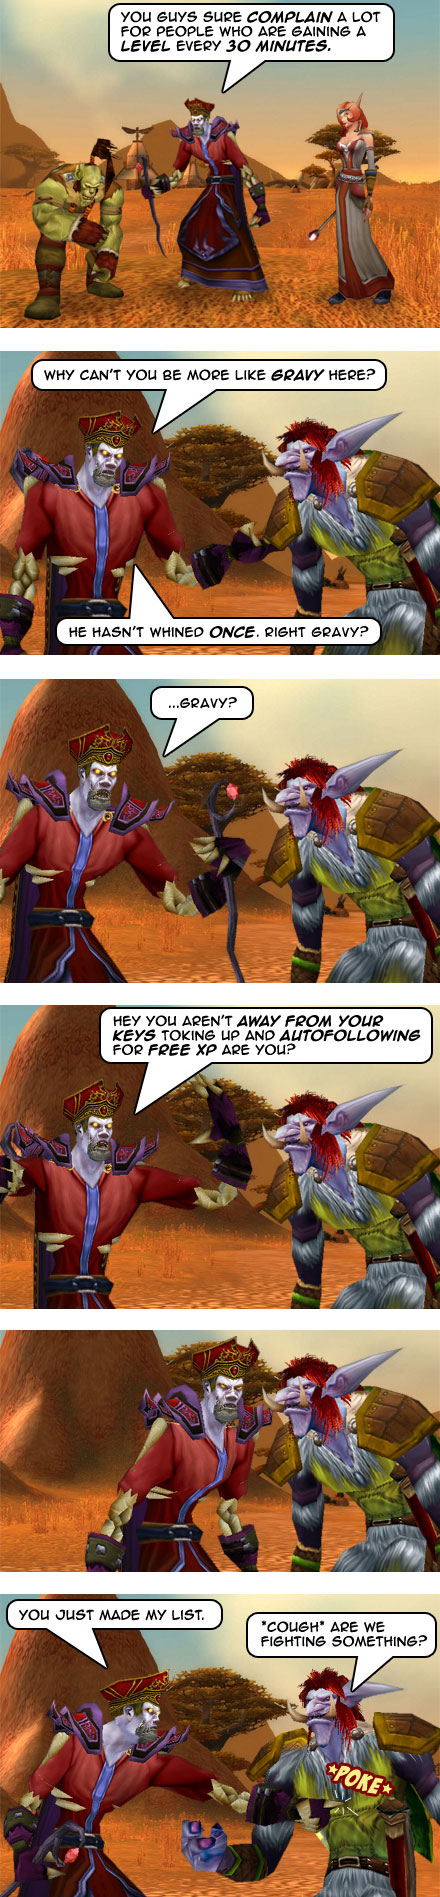 Part 8: Earning XP the Gravy Way